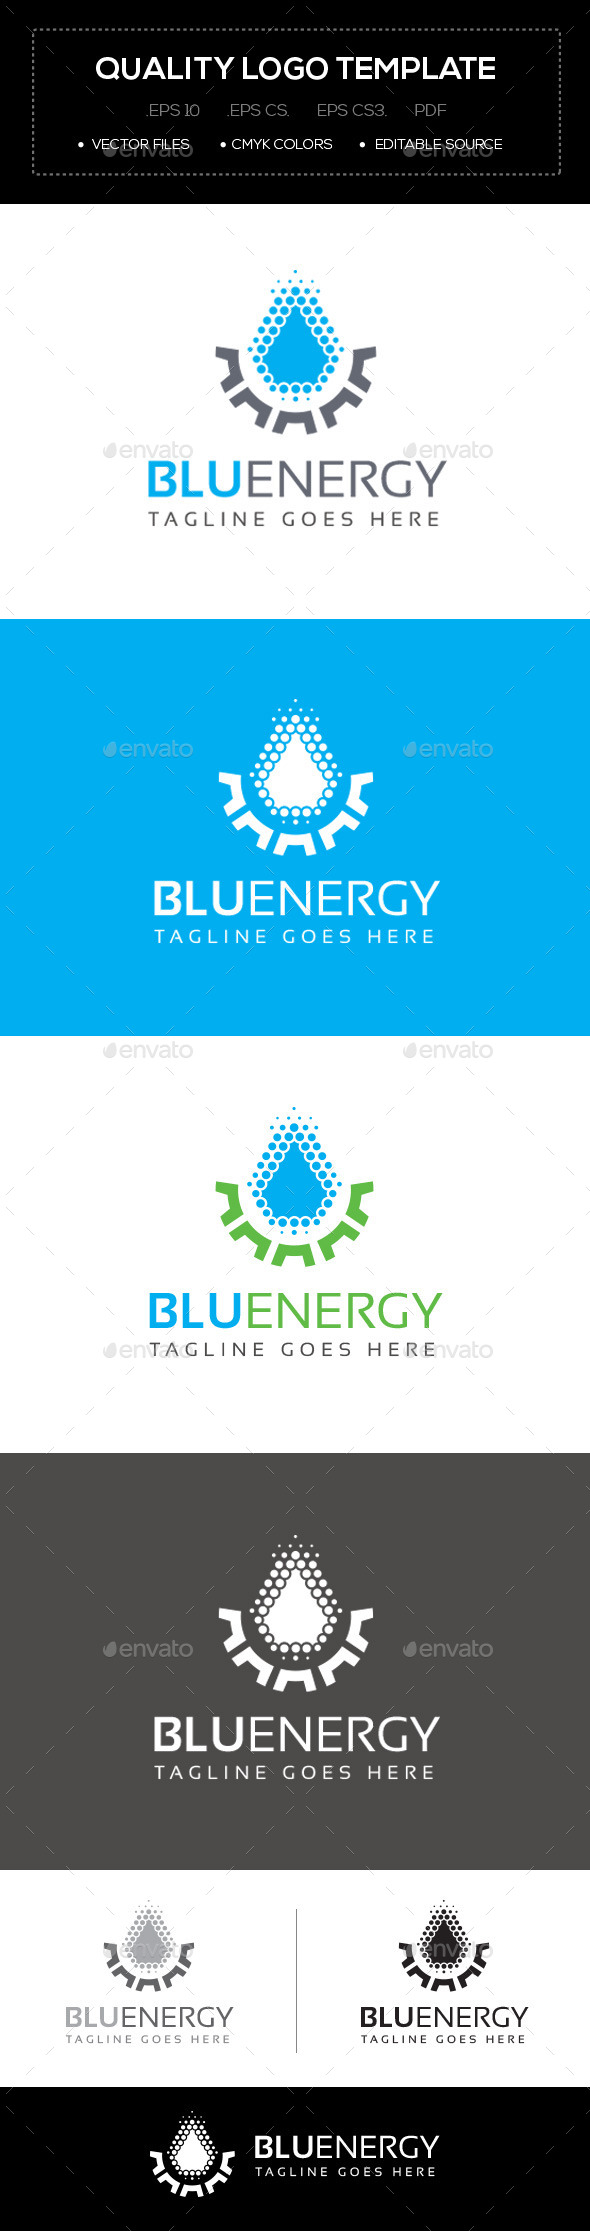 Blu Energy Logo Template - Abstract Logo Templates